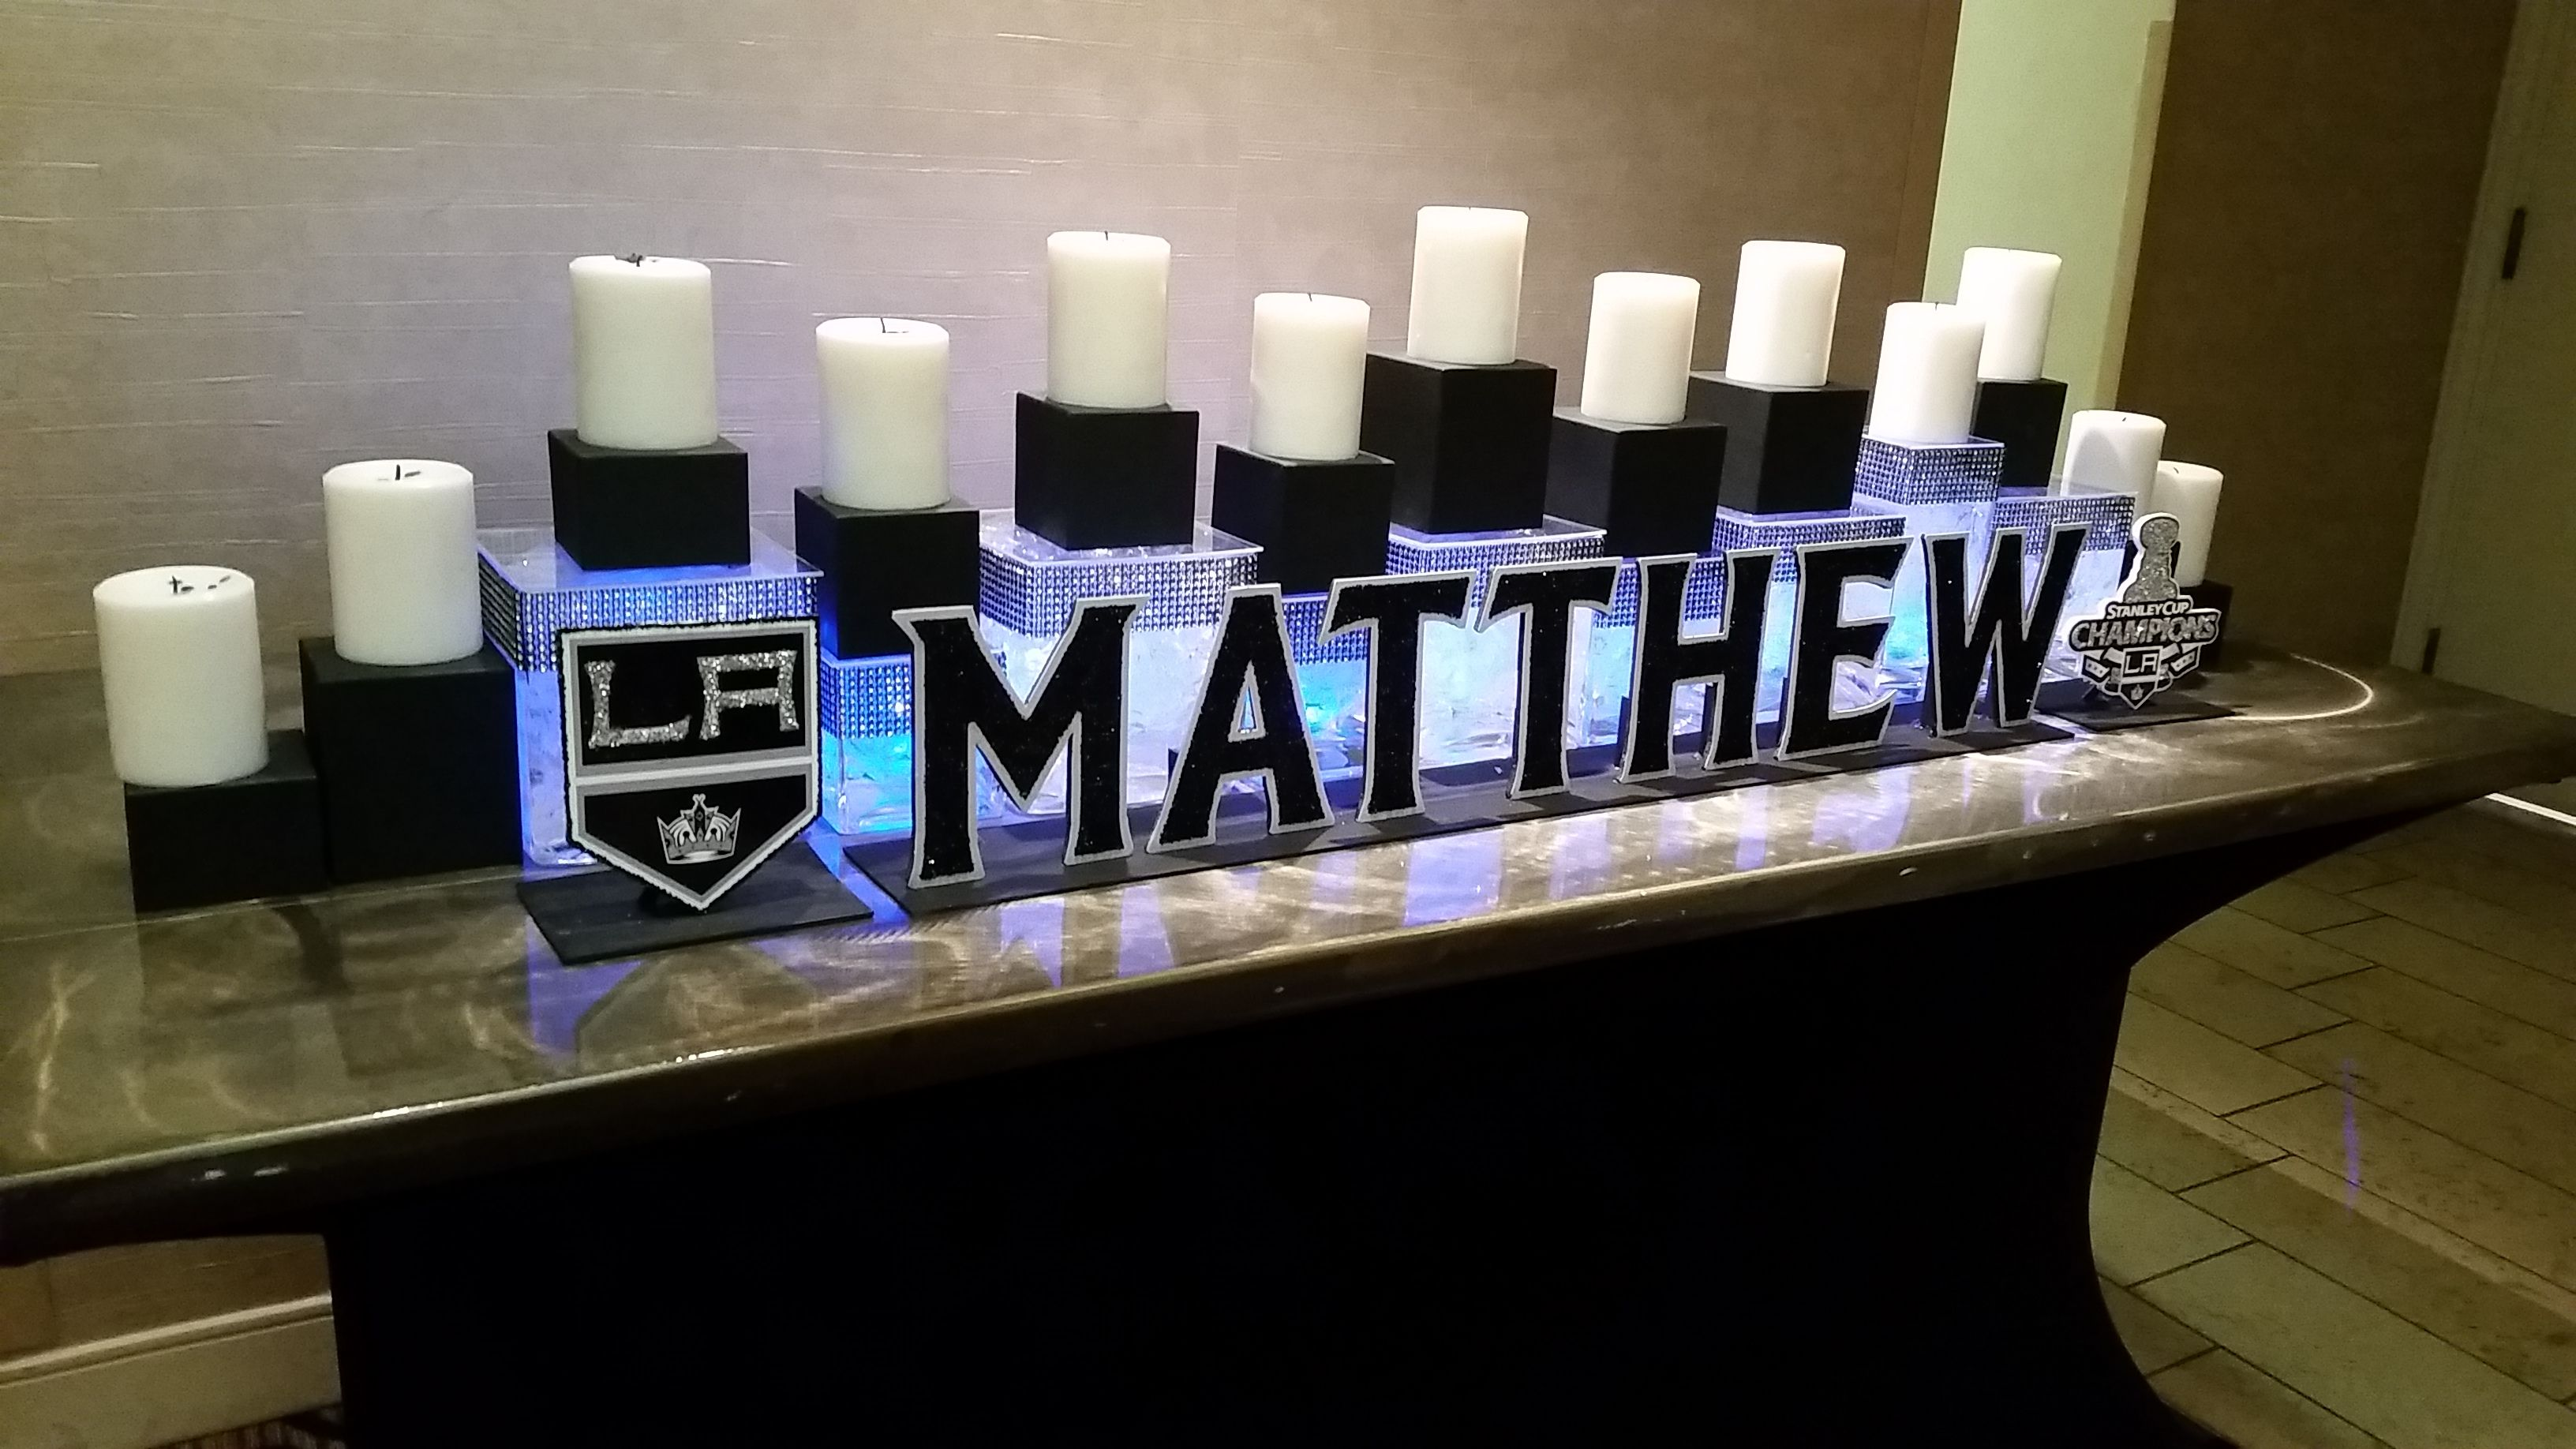 hockey themed candle lighting display